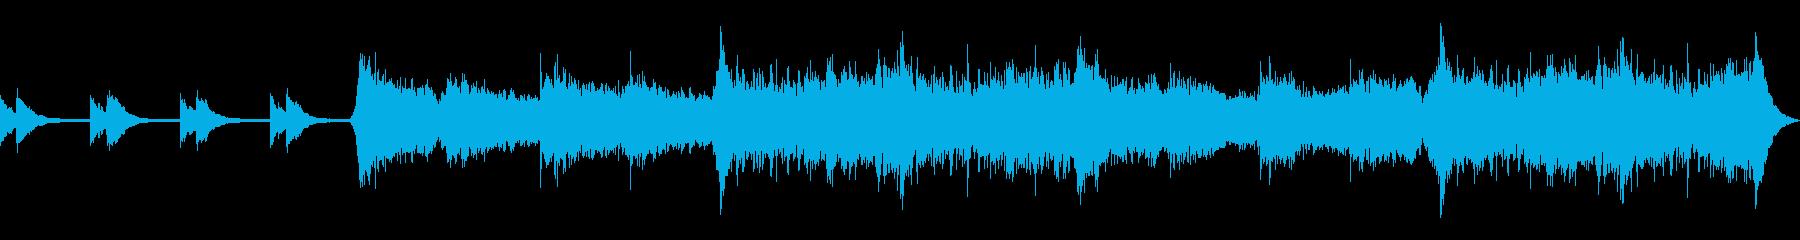 RPG:ダンジョン用BGM1の再生済みの波形